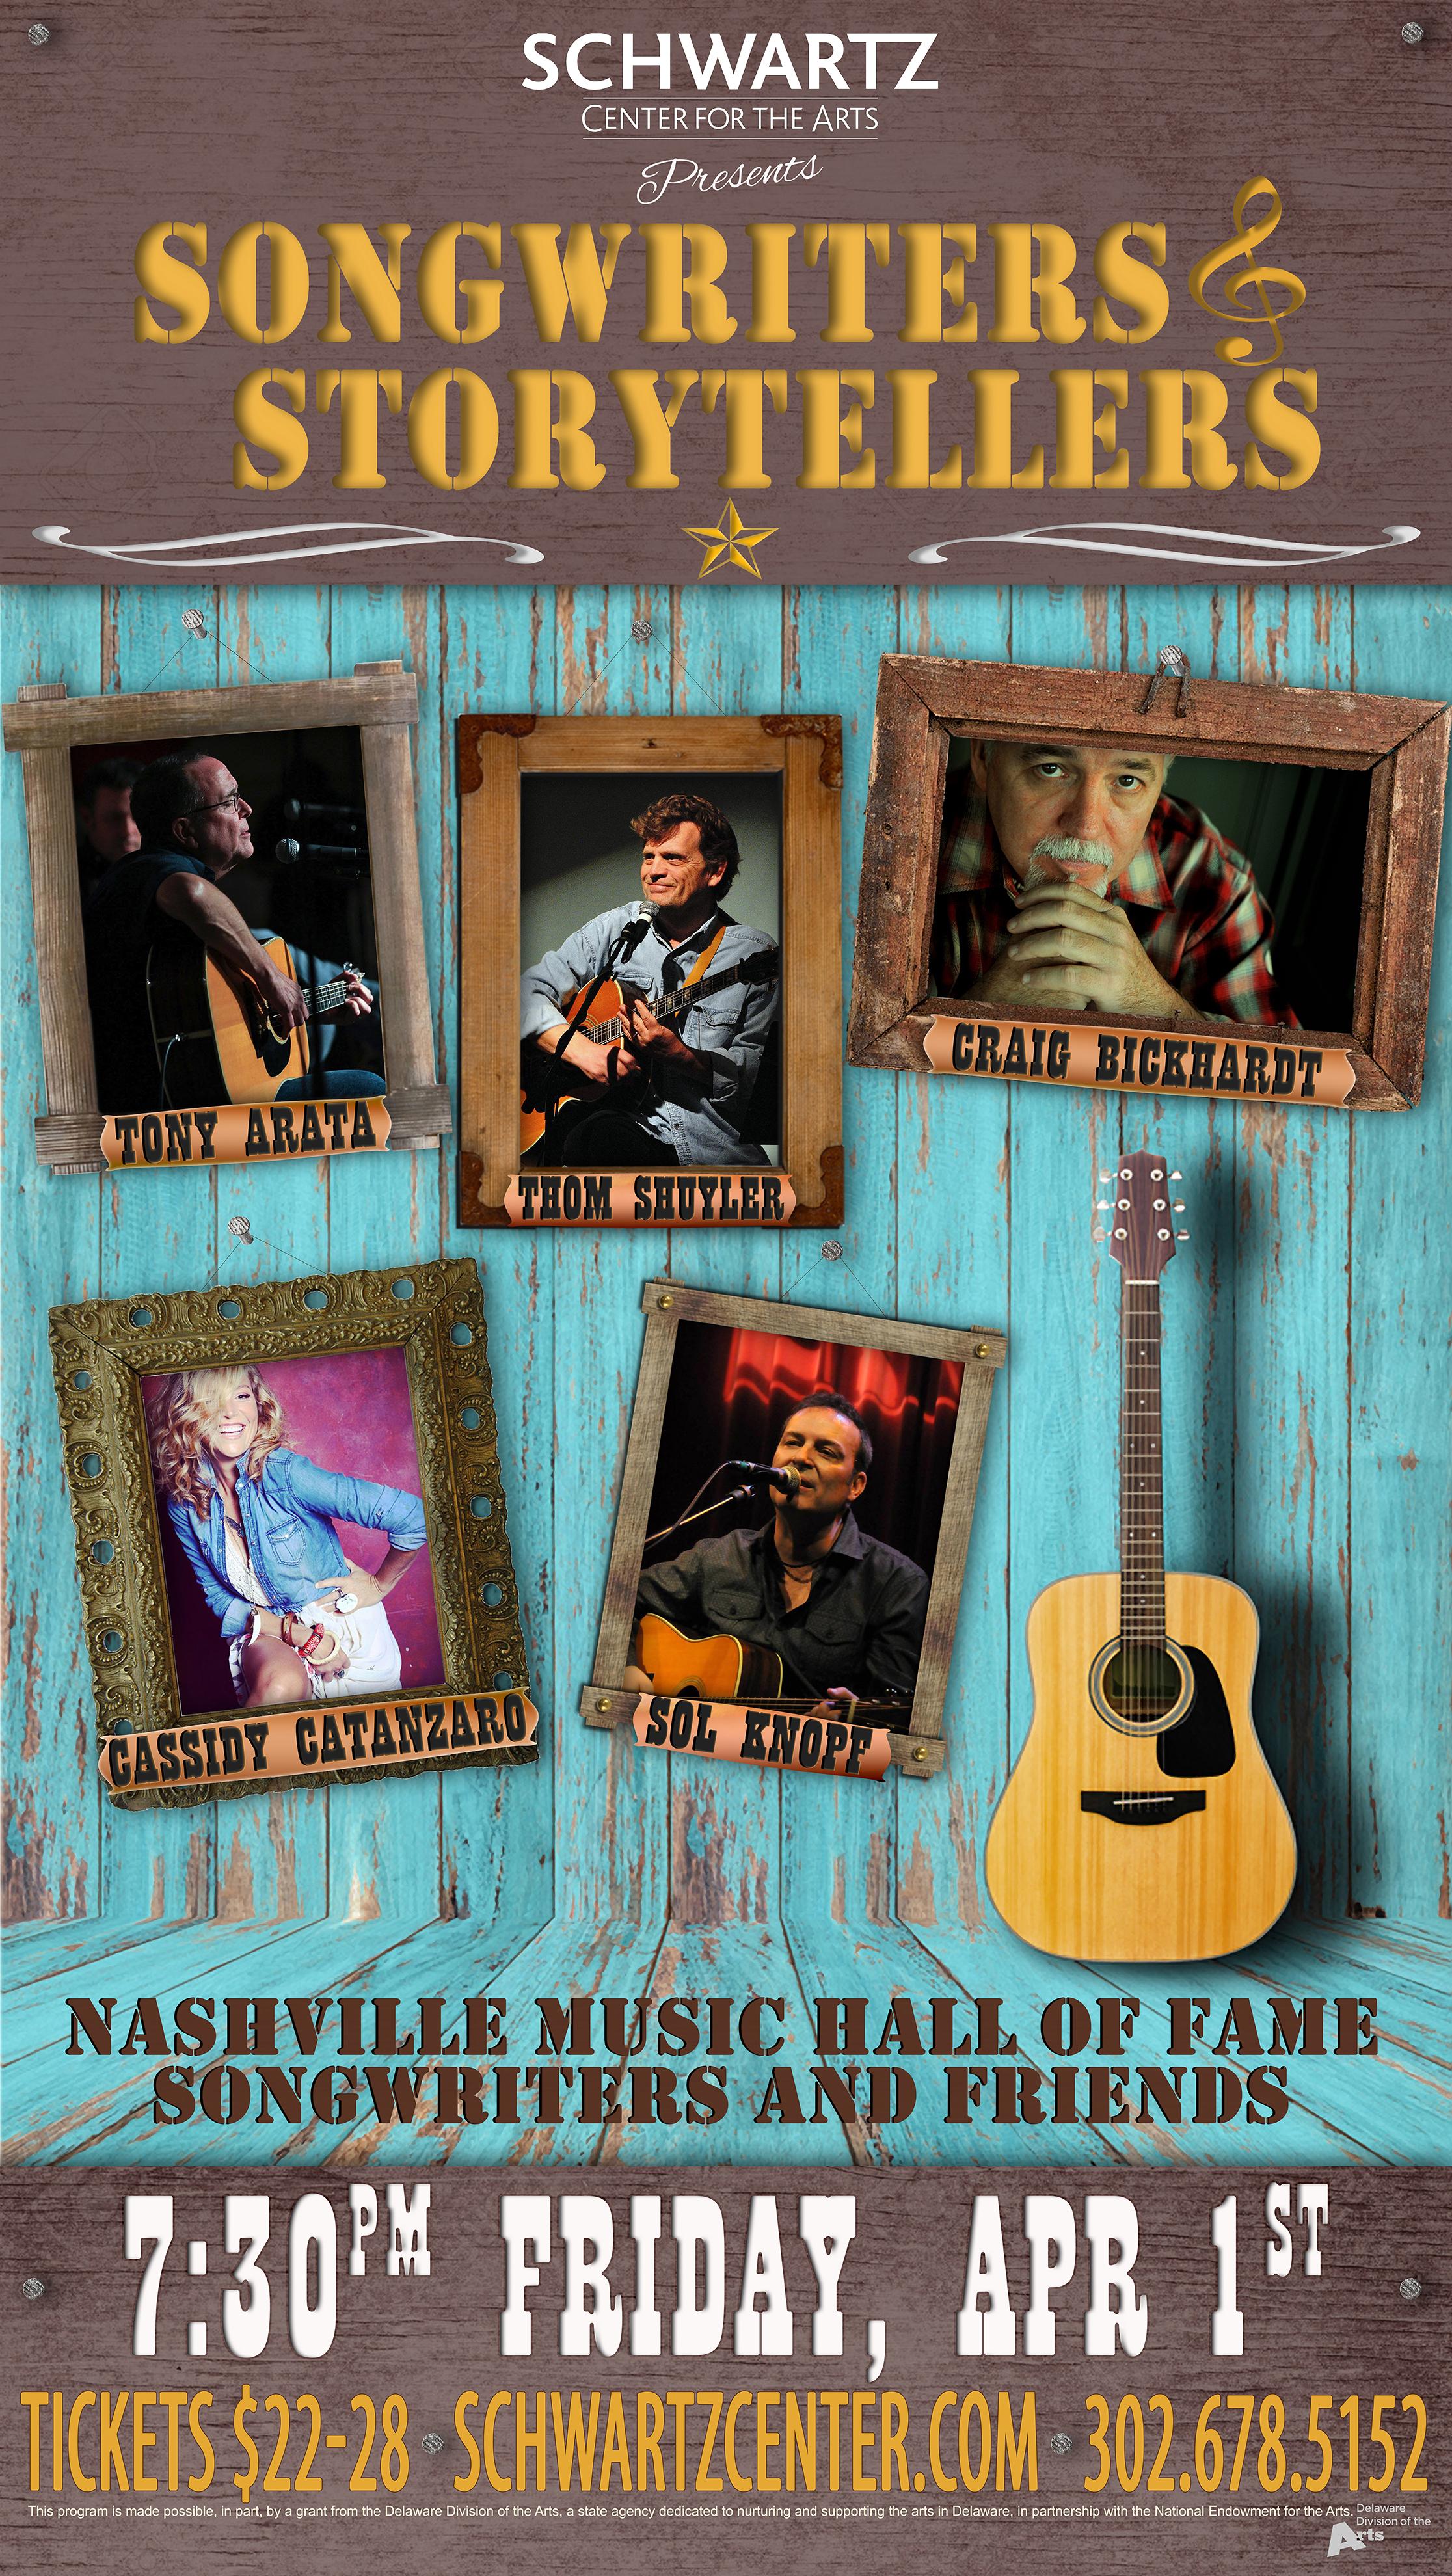 Concert Poster - Tony Arata, Thom Shuyler, Craig Bickhardt, Cassidy Catanzaro, Sol Knopf